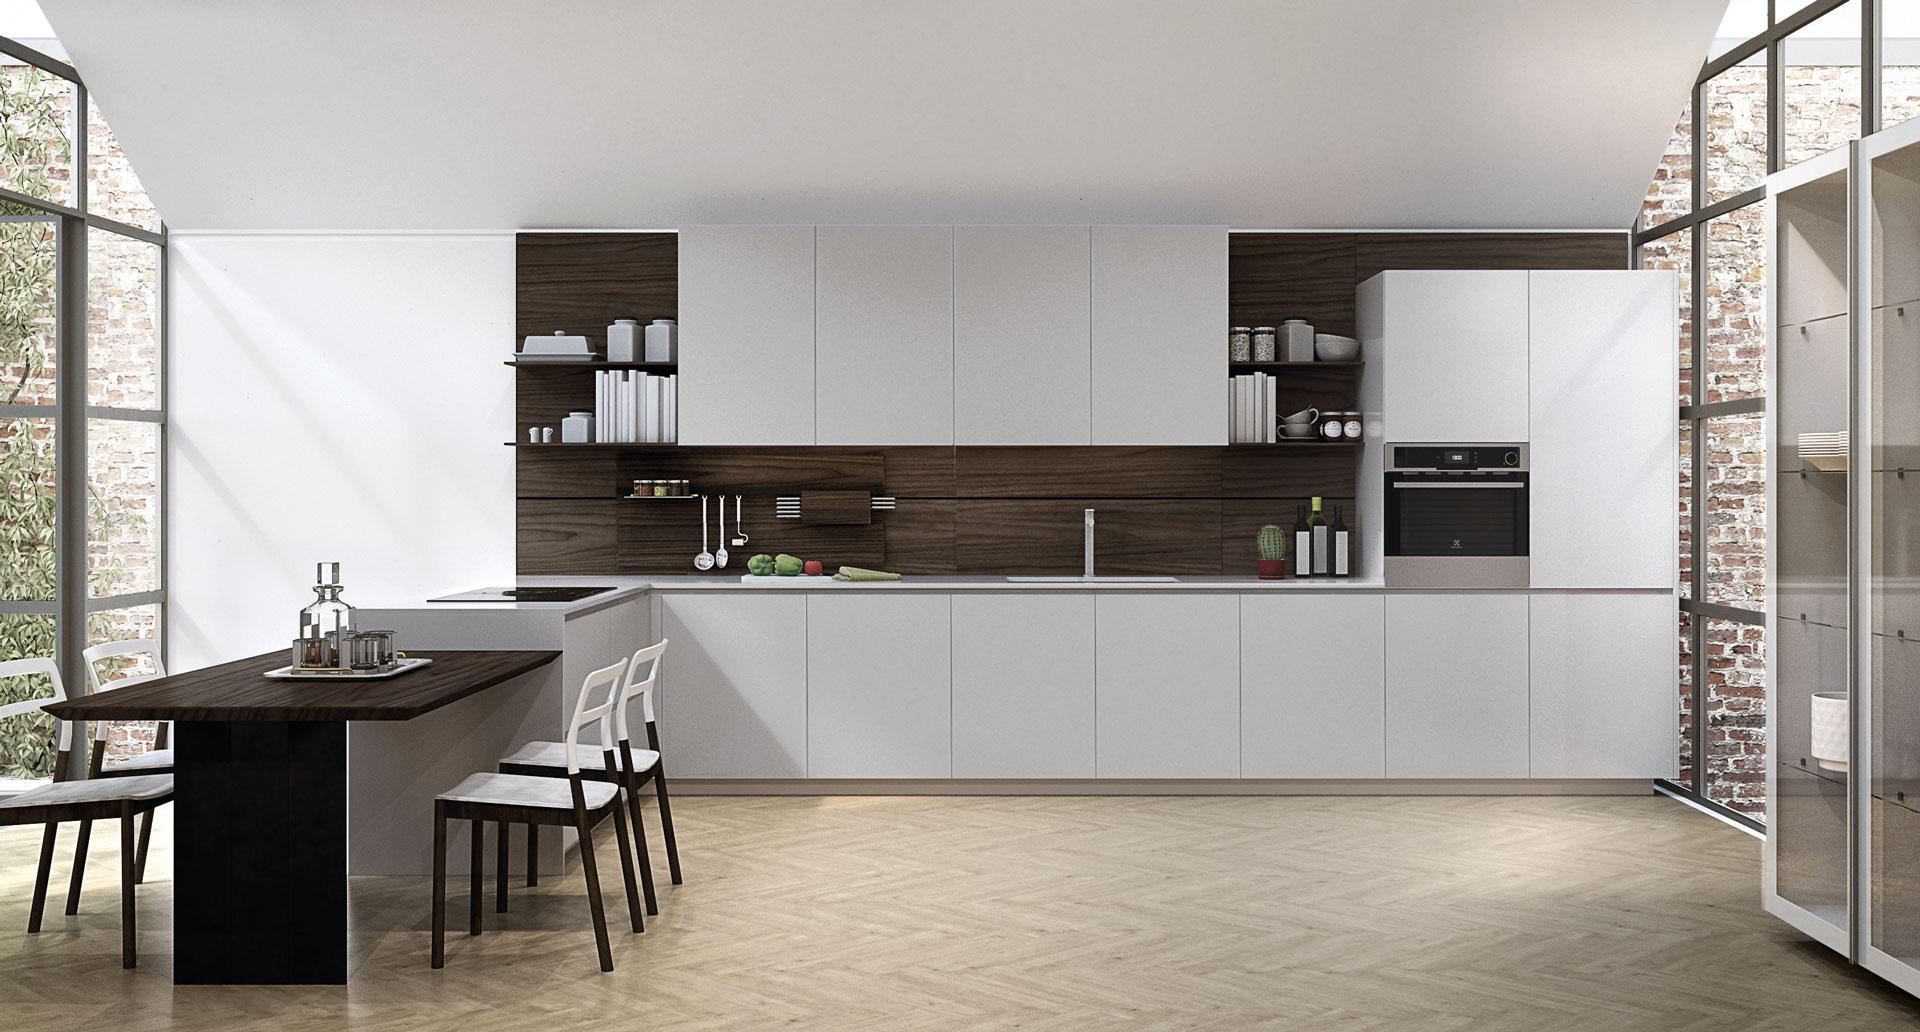 Cucine Poliform Lissone | Habitat Casa rivenditore Poliform